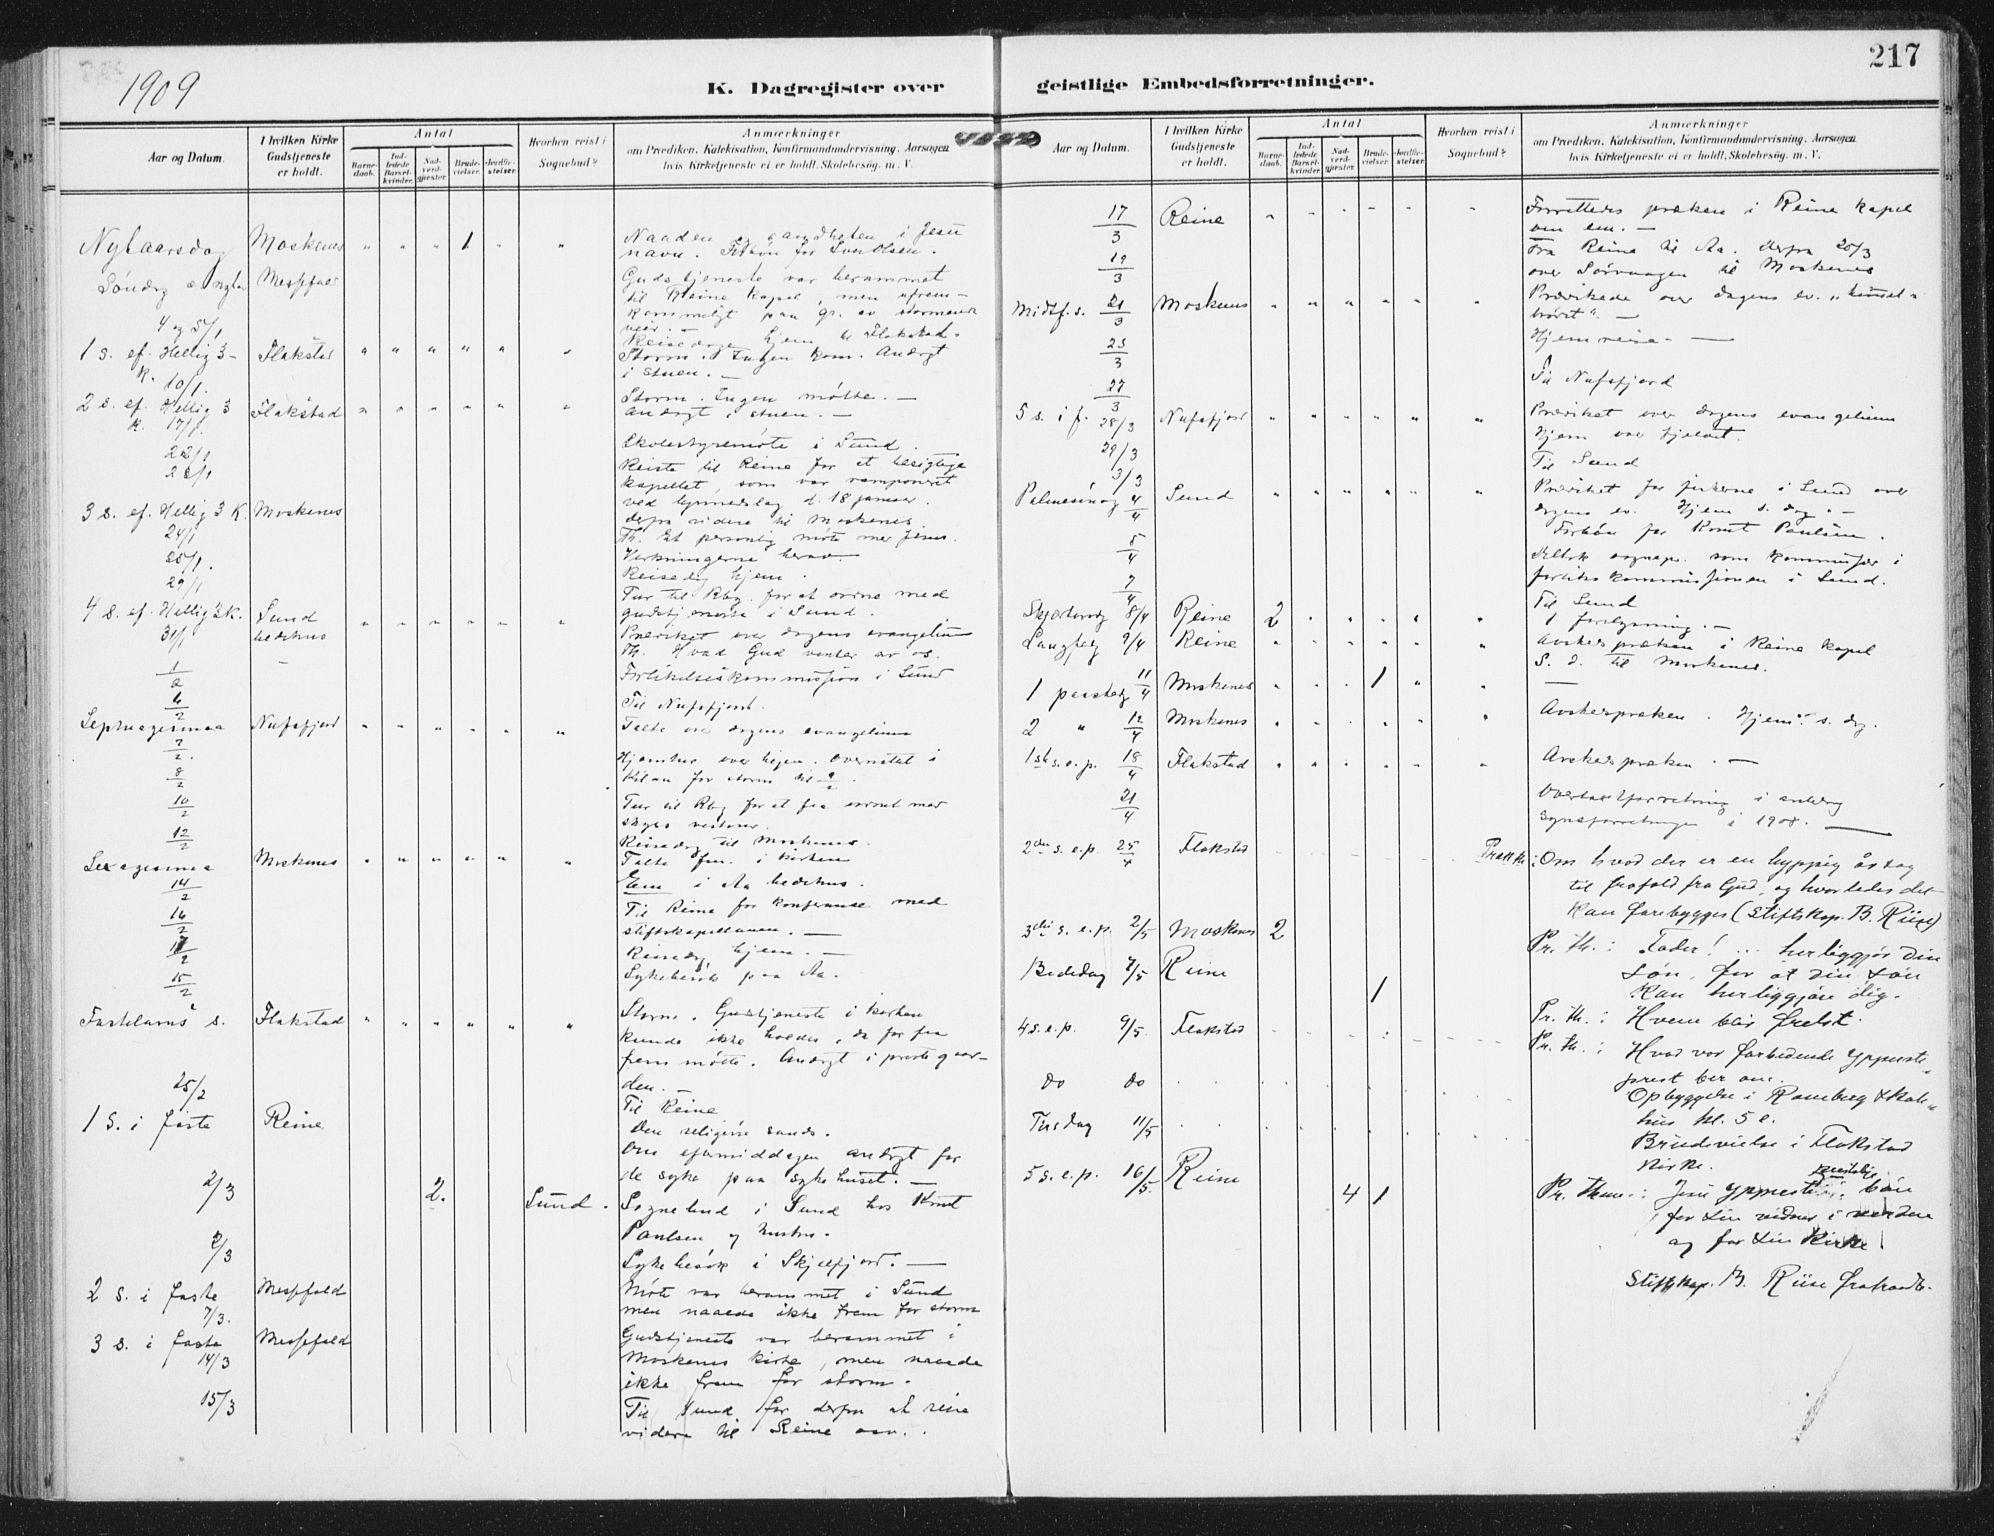 SAT, Ministerialprotokoller, klokkerbøker og fødselsregistre - Nordland, 885/L1206: Ministerialbok nr. 885A07, 1905-1915, s. 217